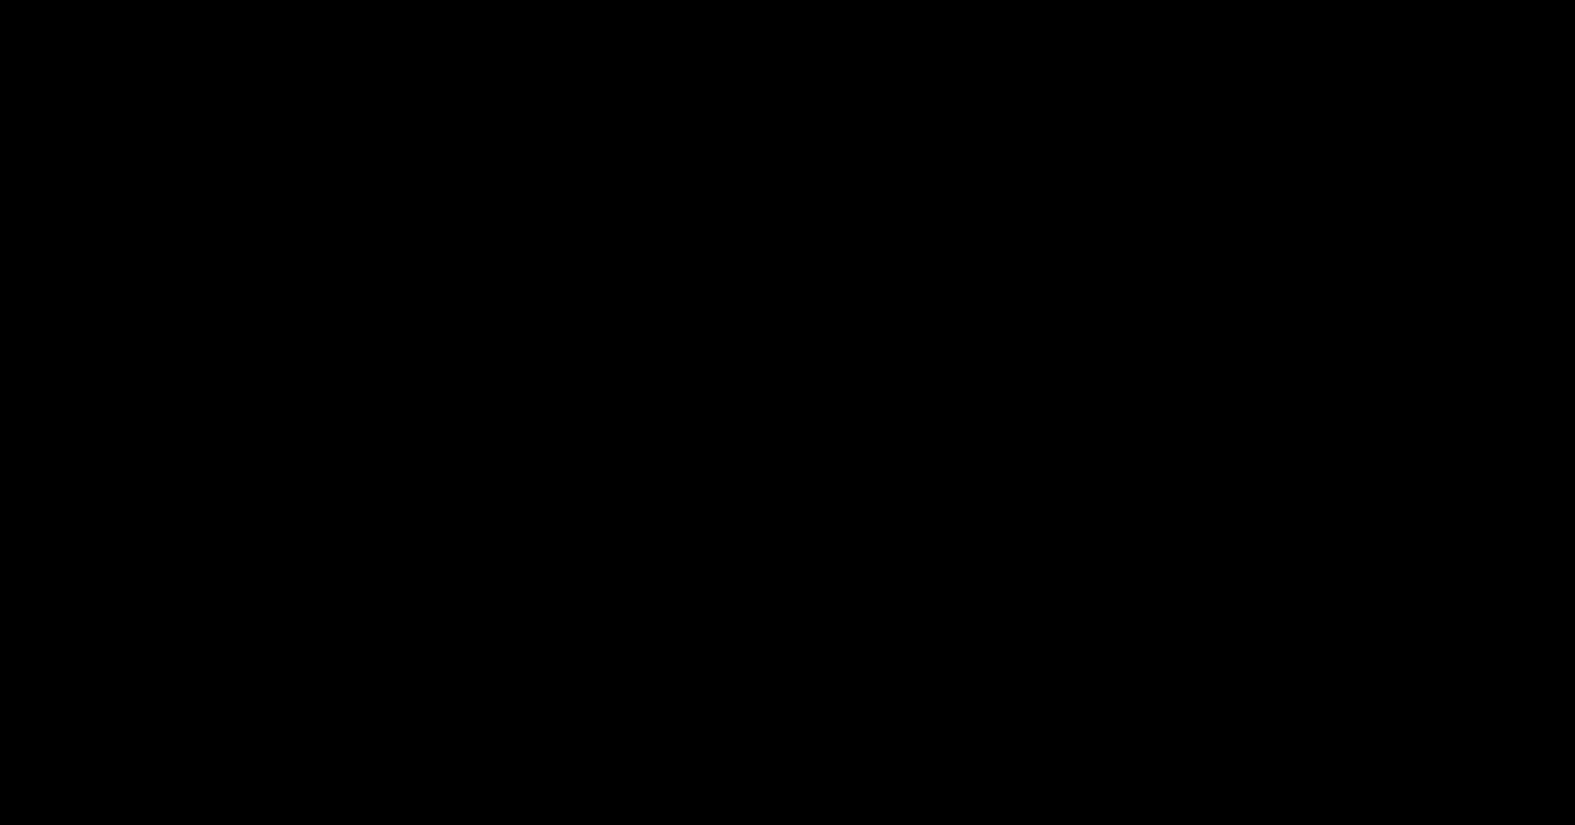 Asus Logo PNG Download Image.